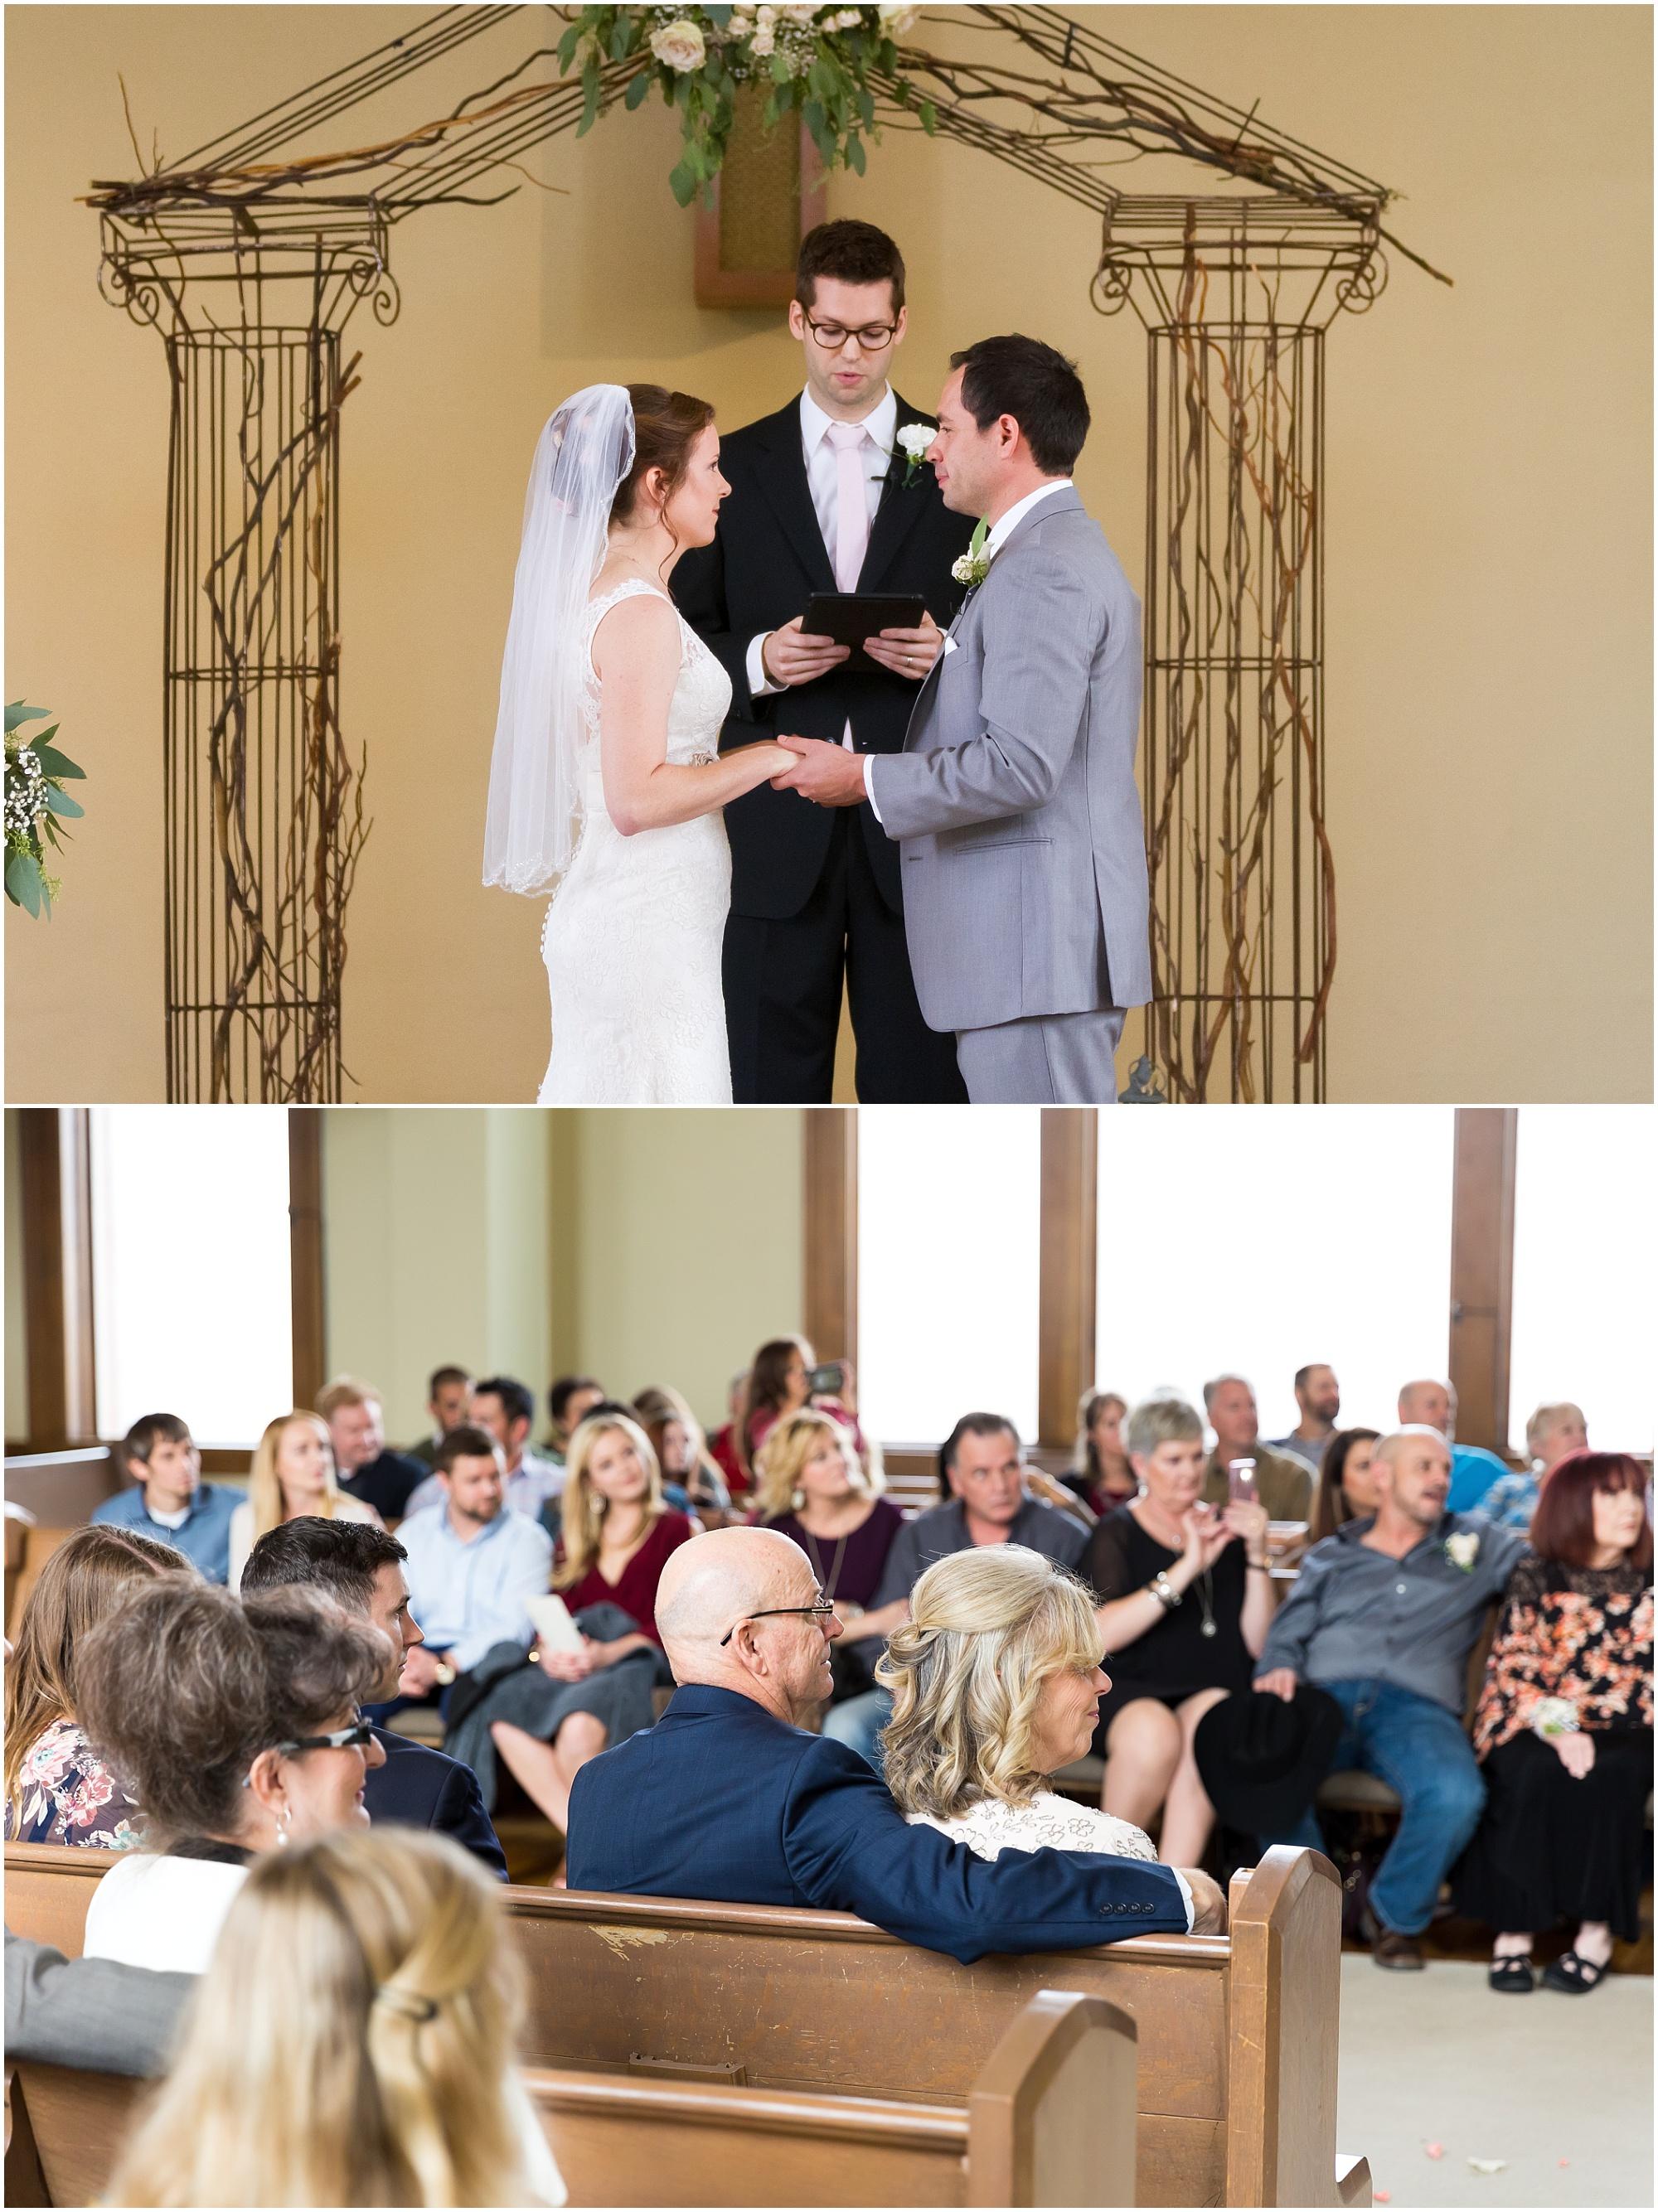 Downtown-Waco-Fall-Wedding_0015.jpg